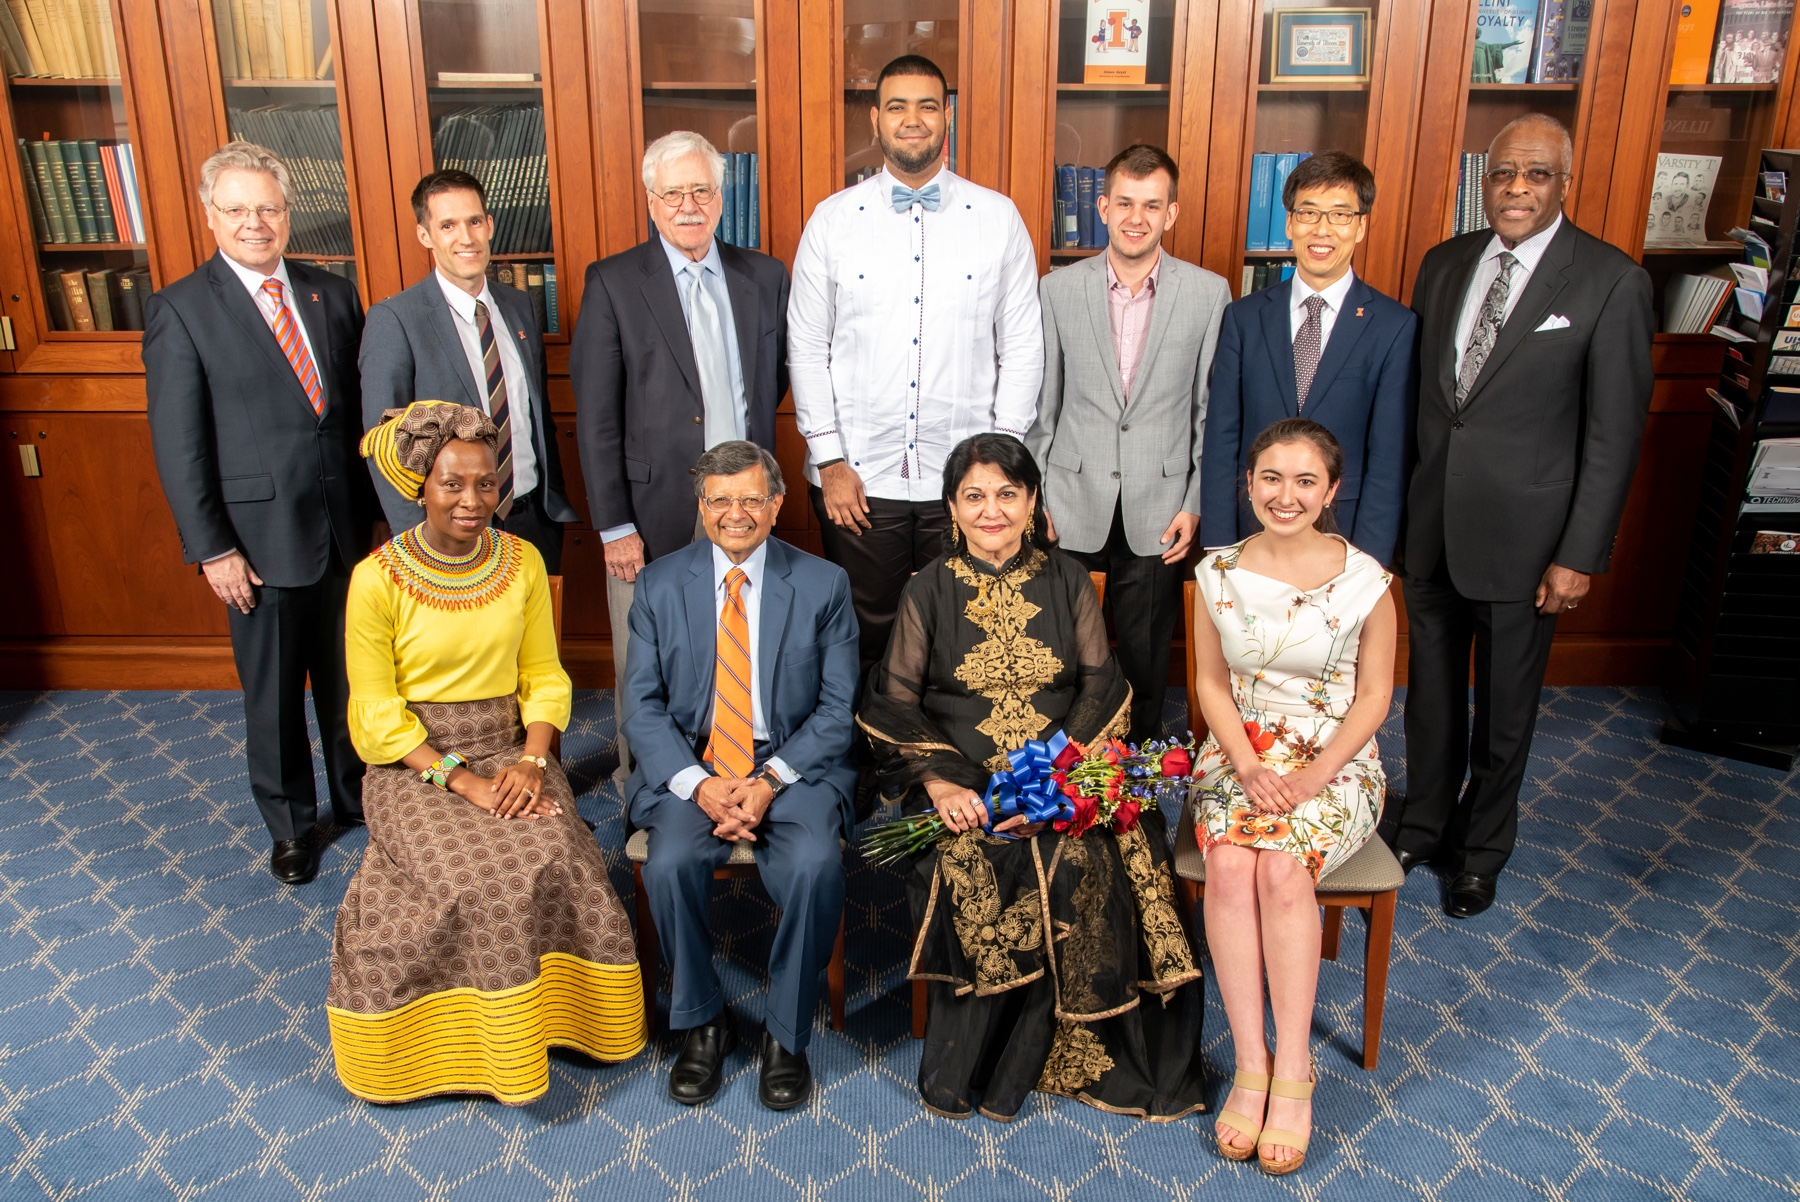 2018 International Achievement Awards Recipient Announced